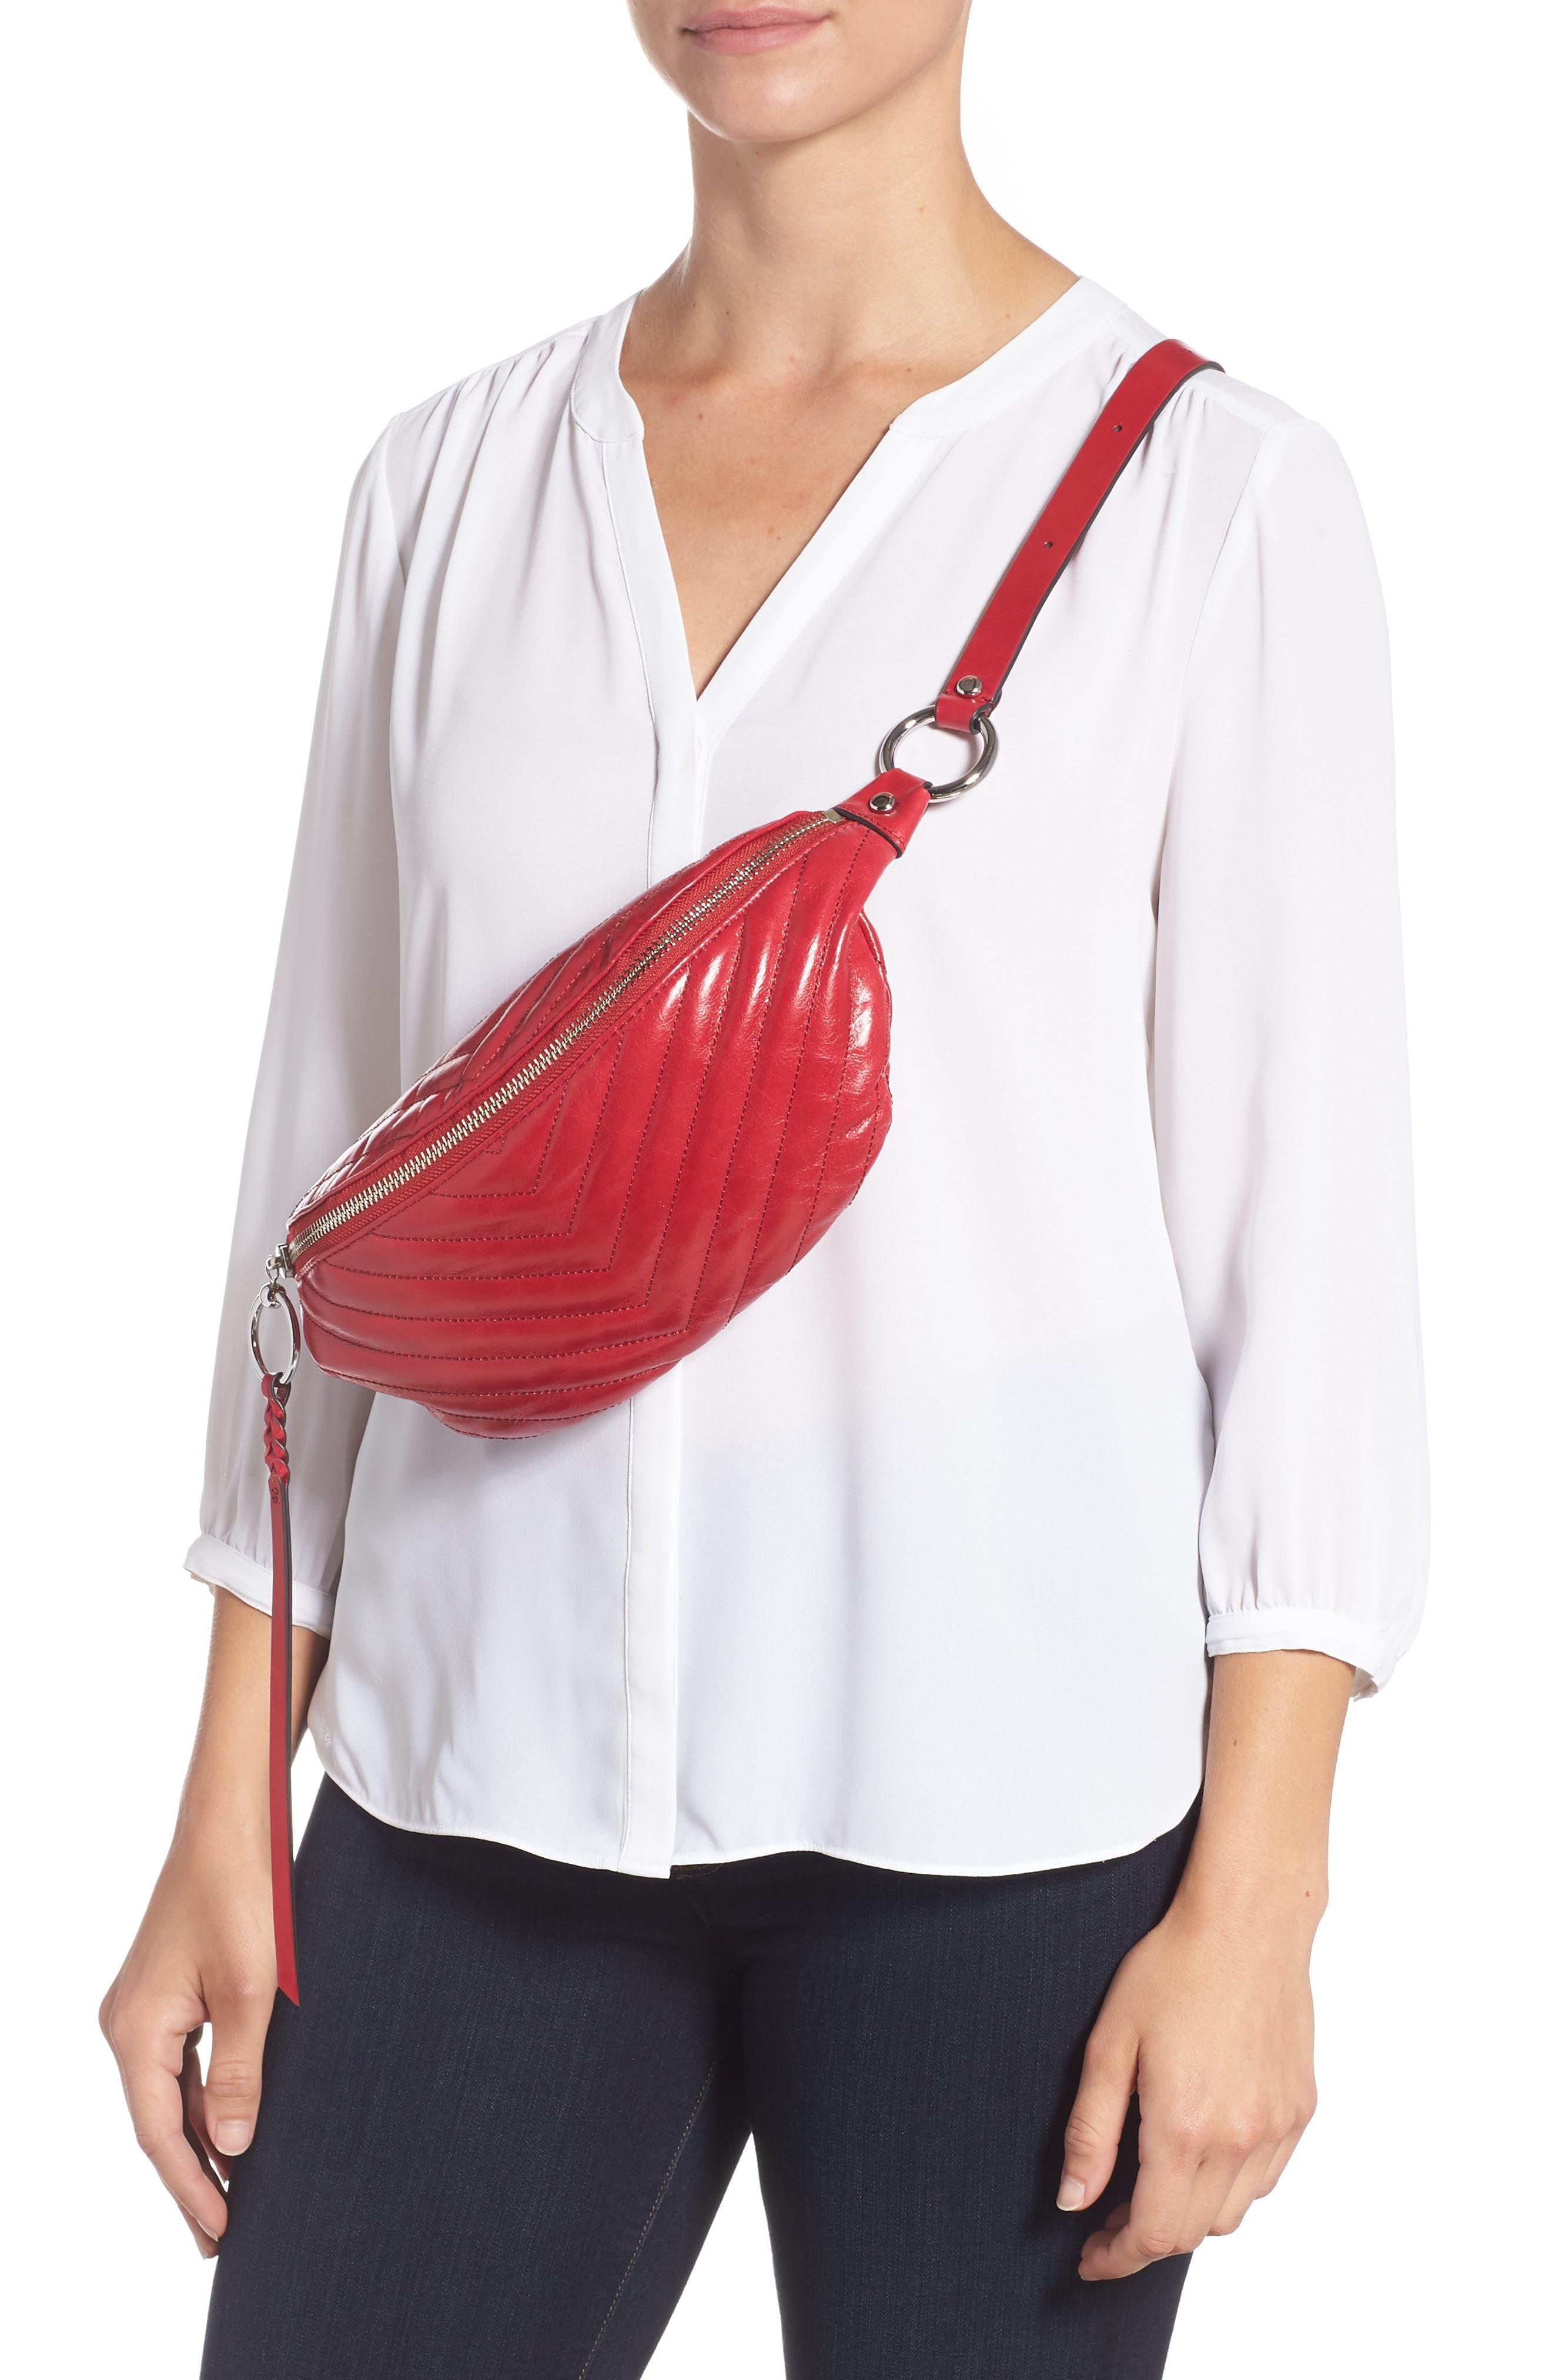 REBECCA MINKOFF, Edie Leather Belt Bag, Alternate thumbnail 4, color, 600